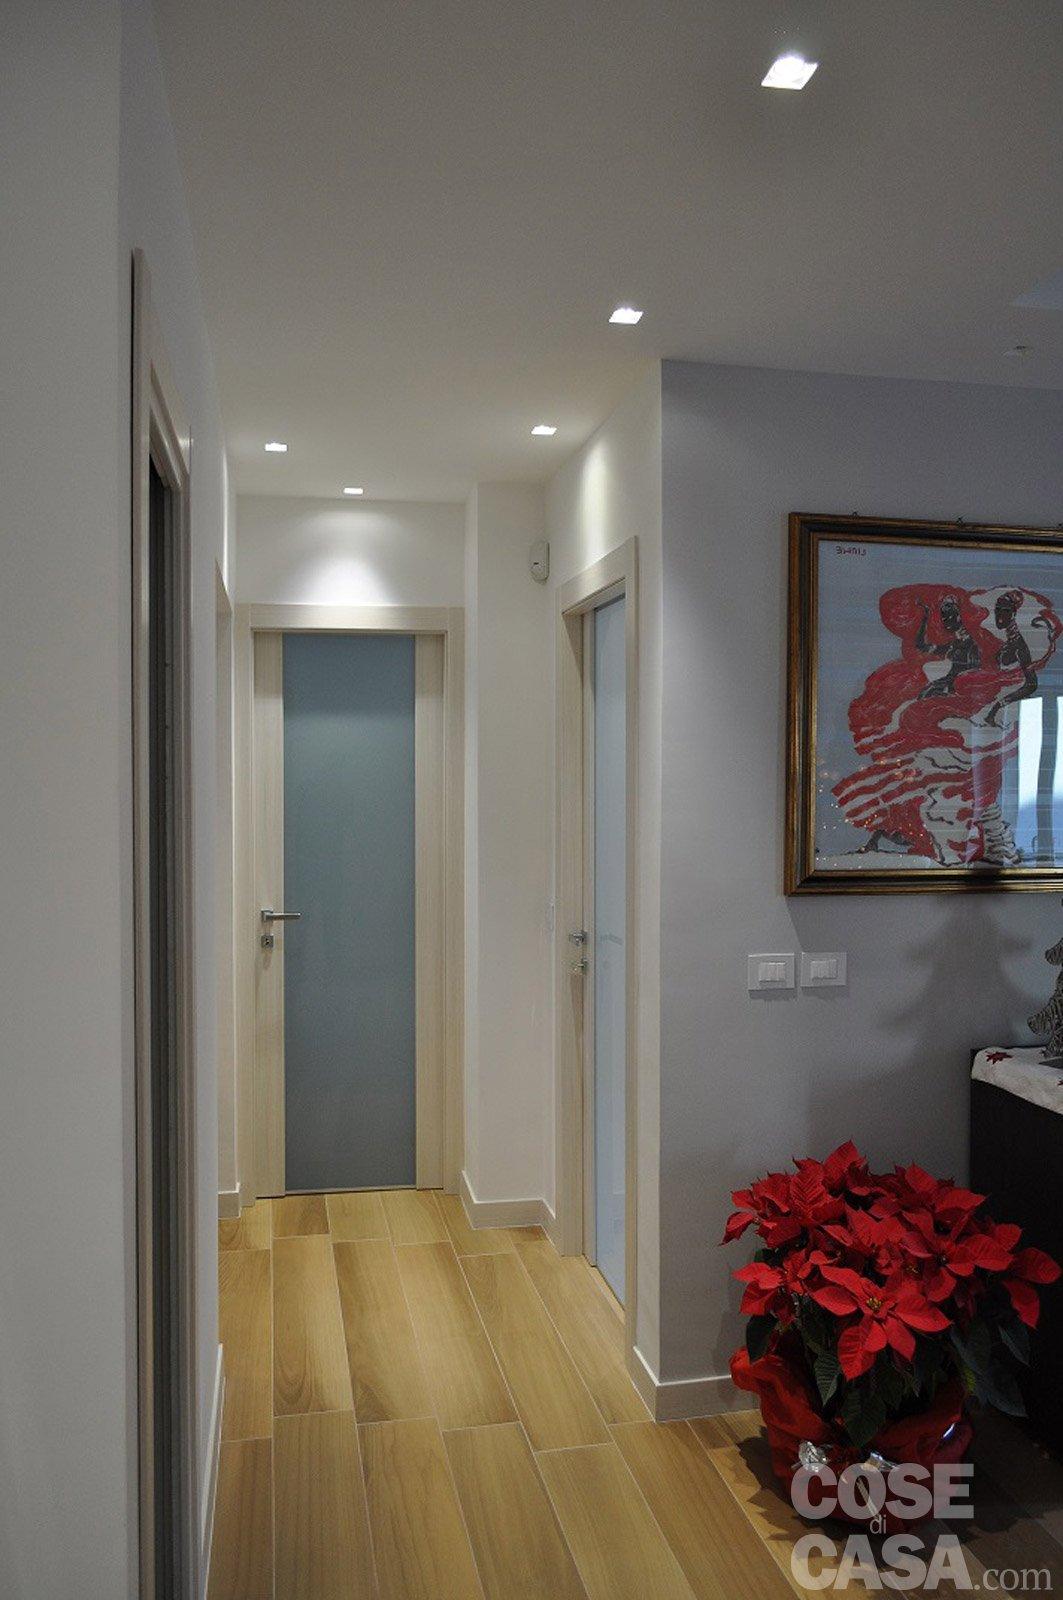 90 mq: una casa da vivere in relax - Cose di Casa